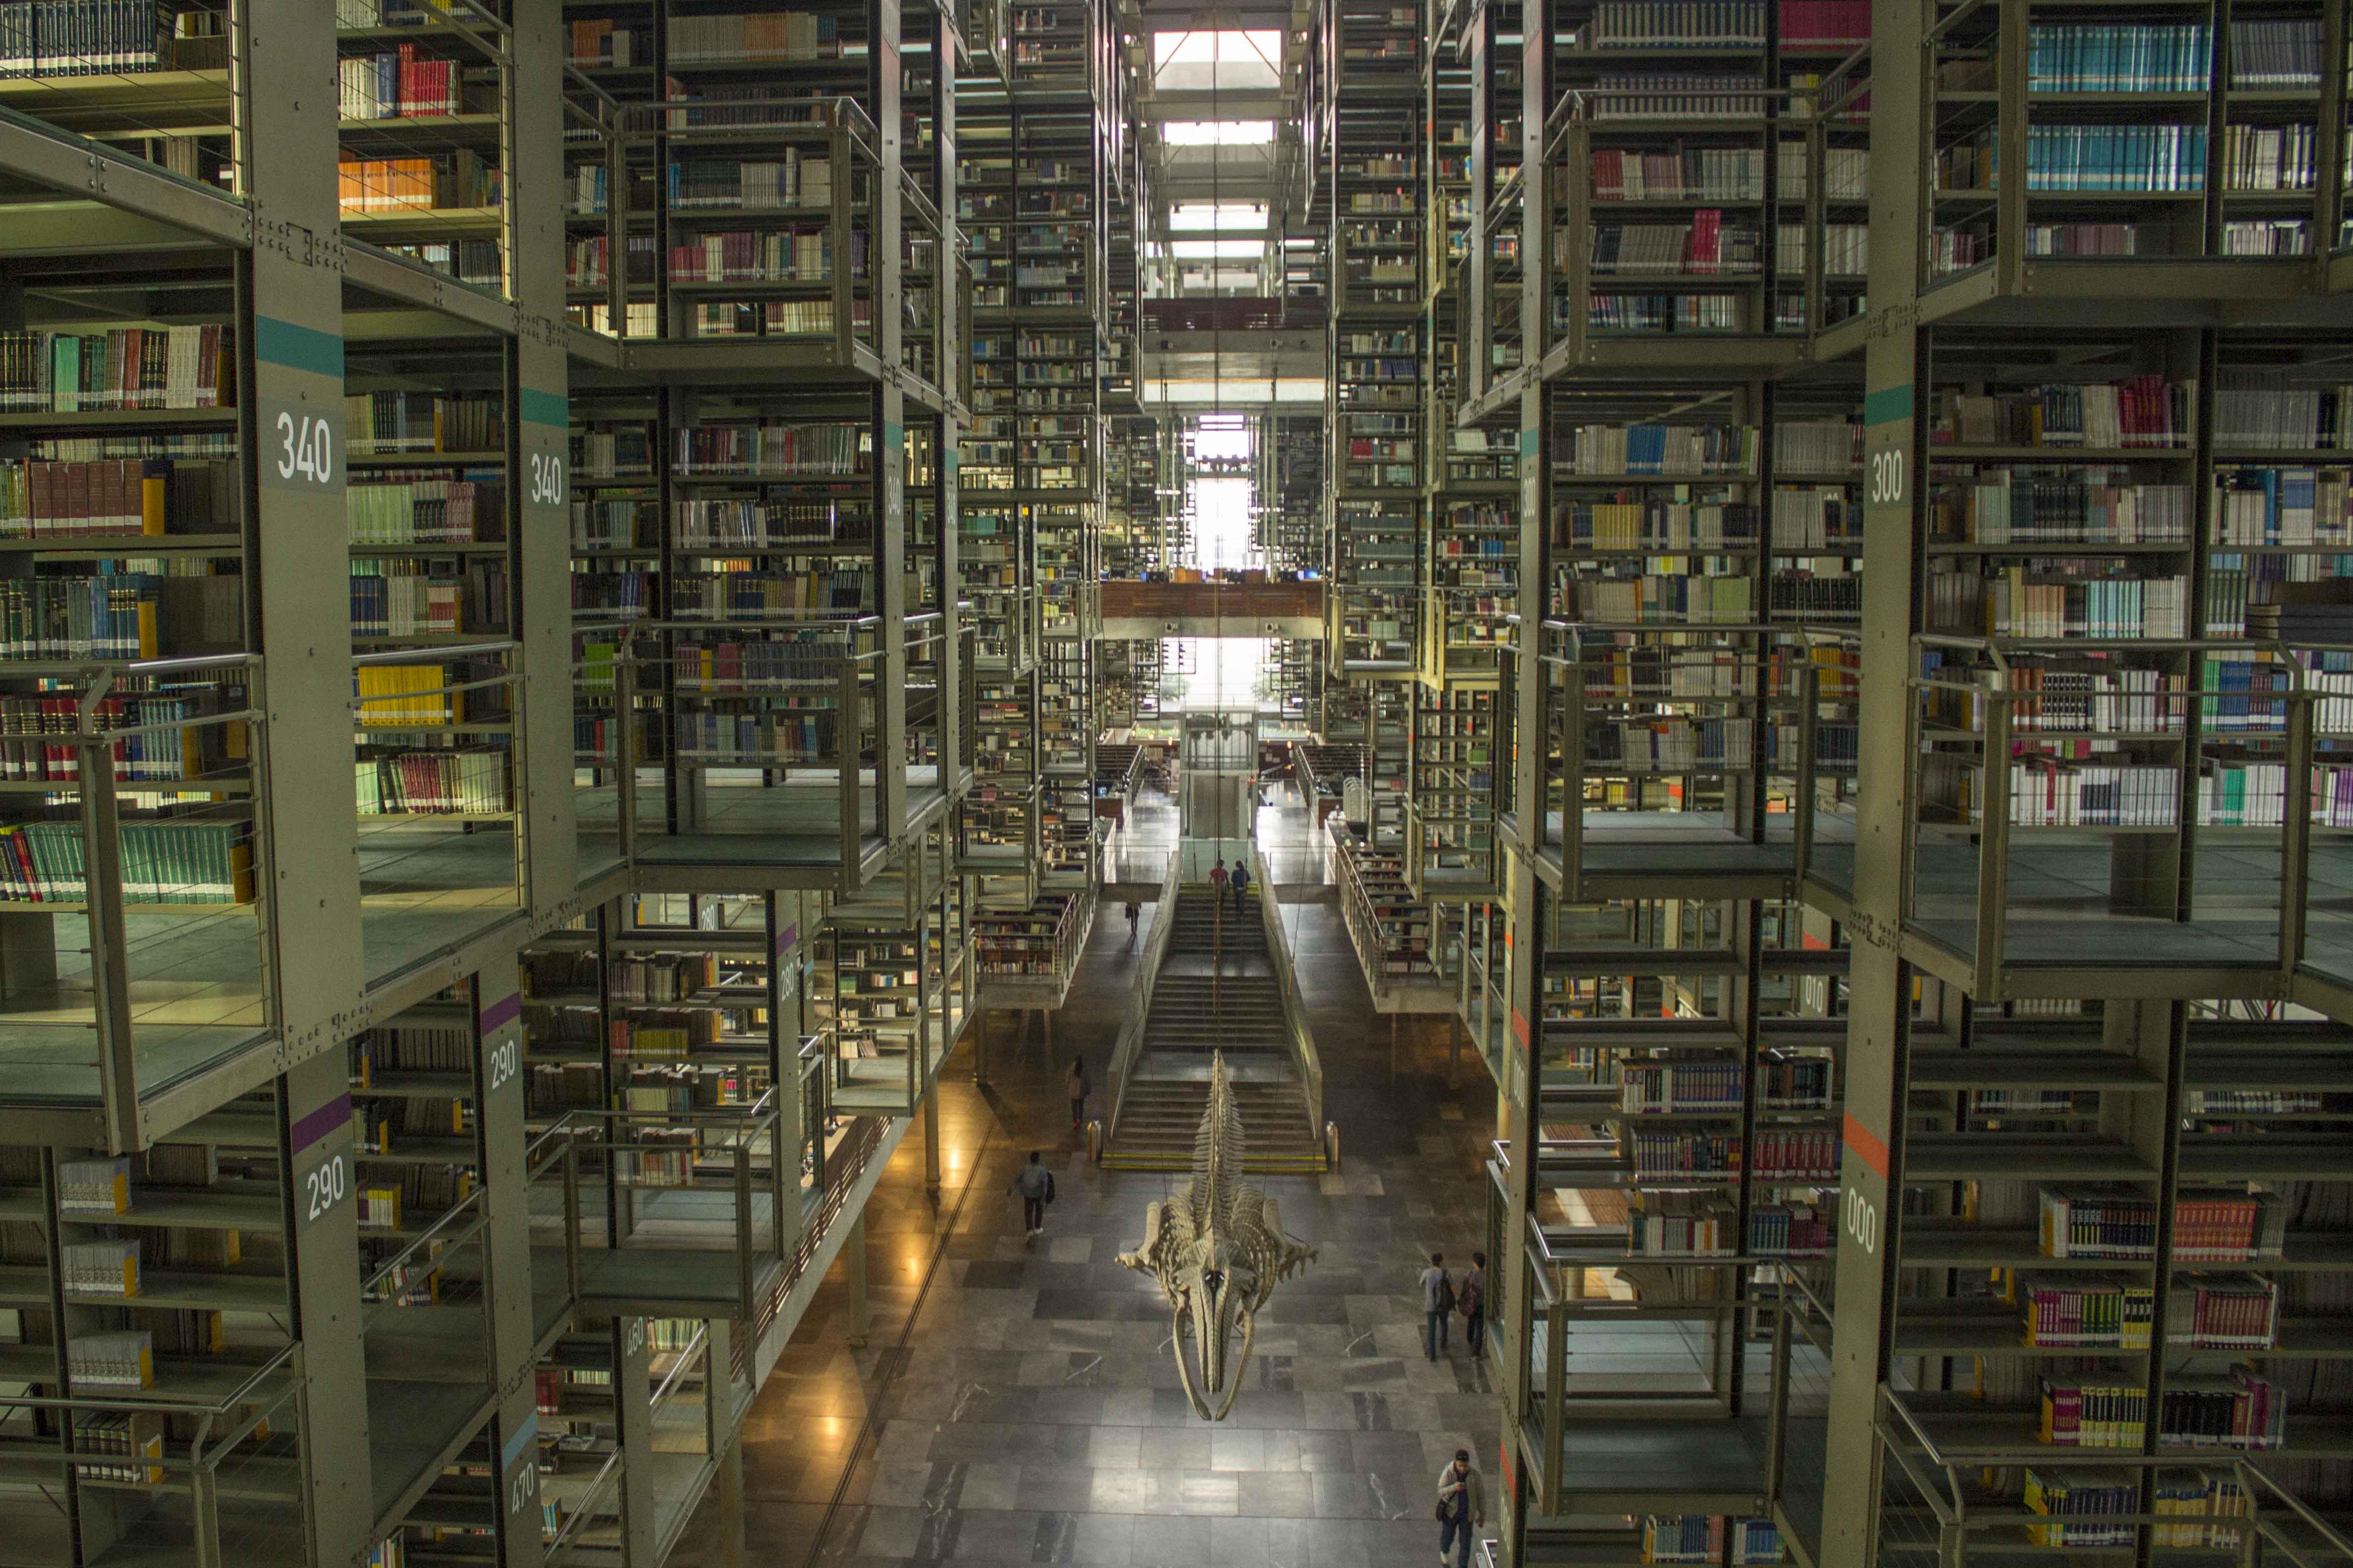 utra modern book shelves at biblioteca vasconcelos